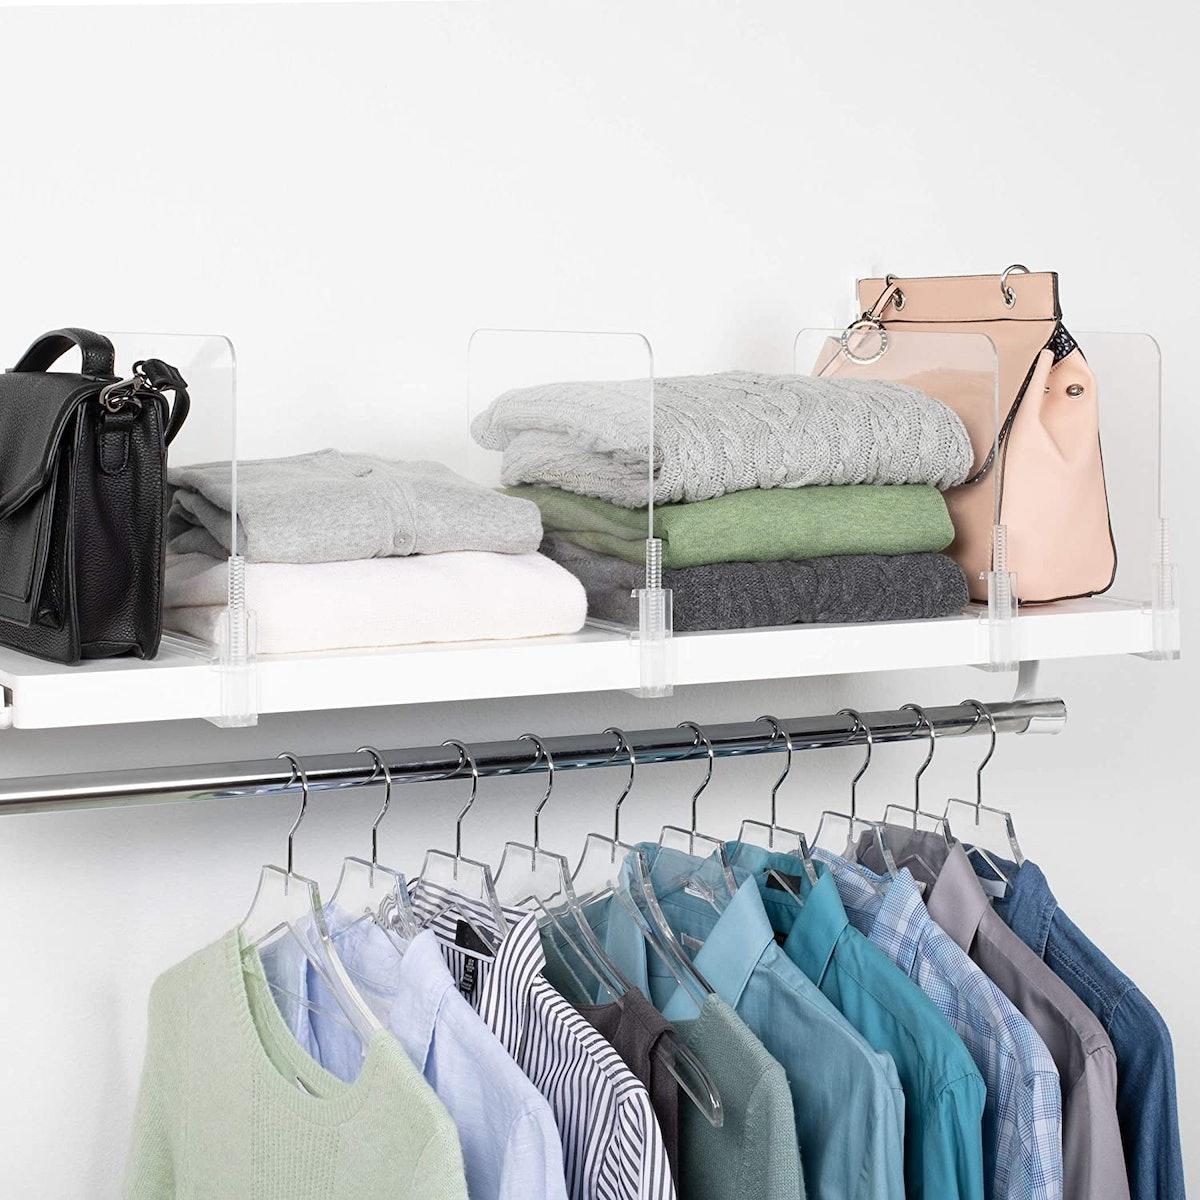 Richards Homewares Shelf Dividers (6-Pack)